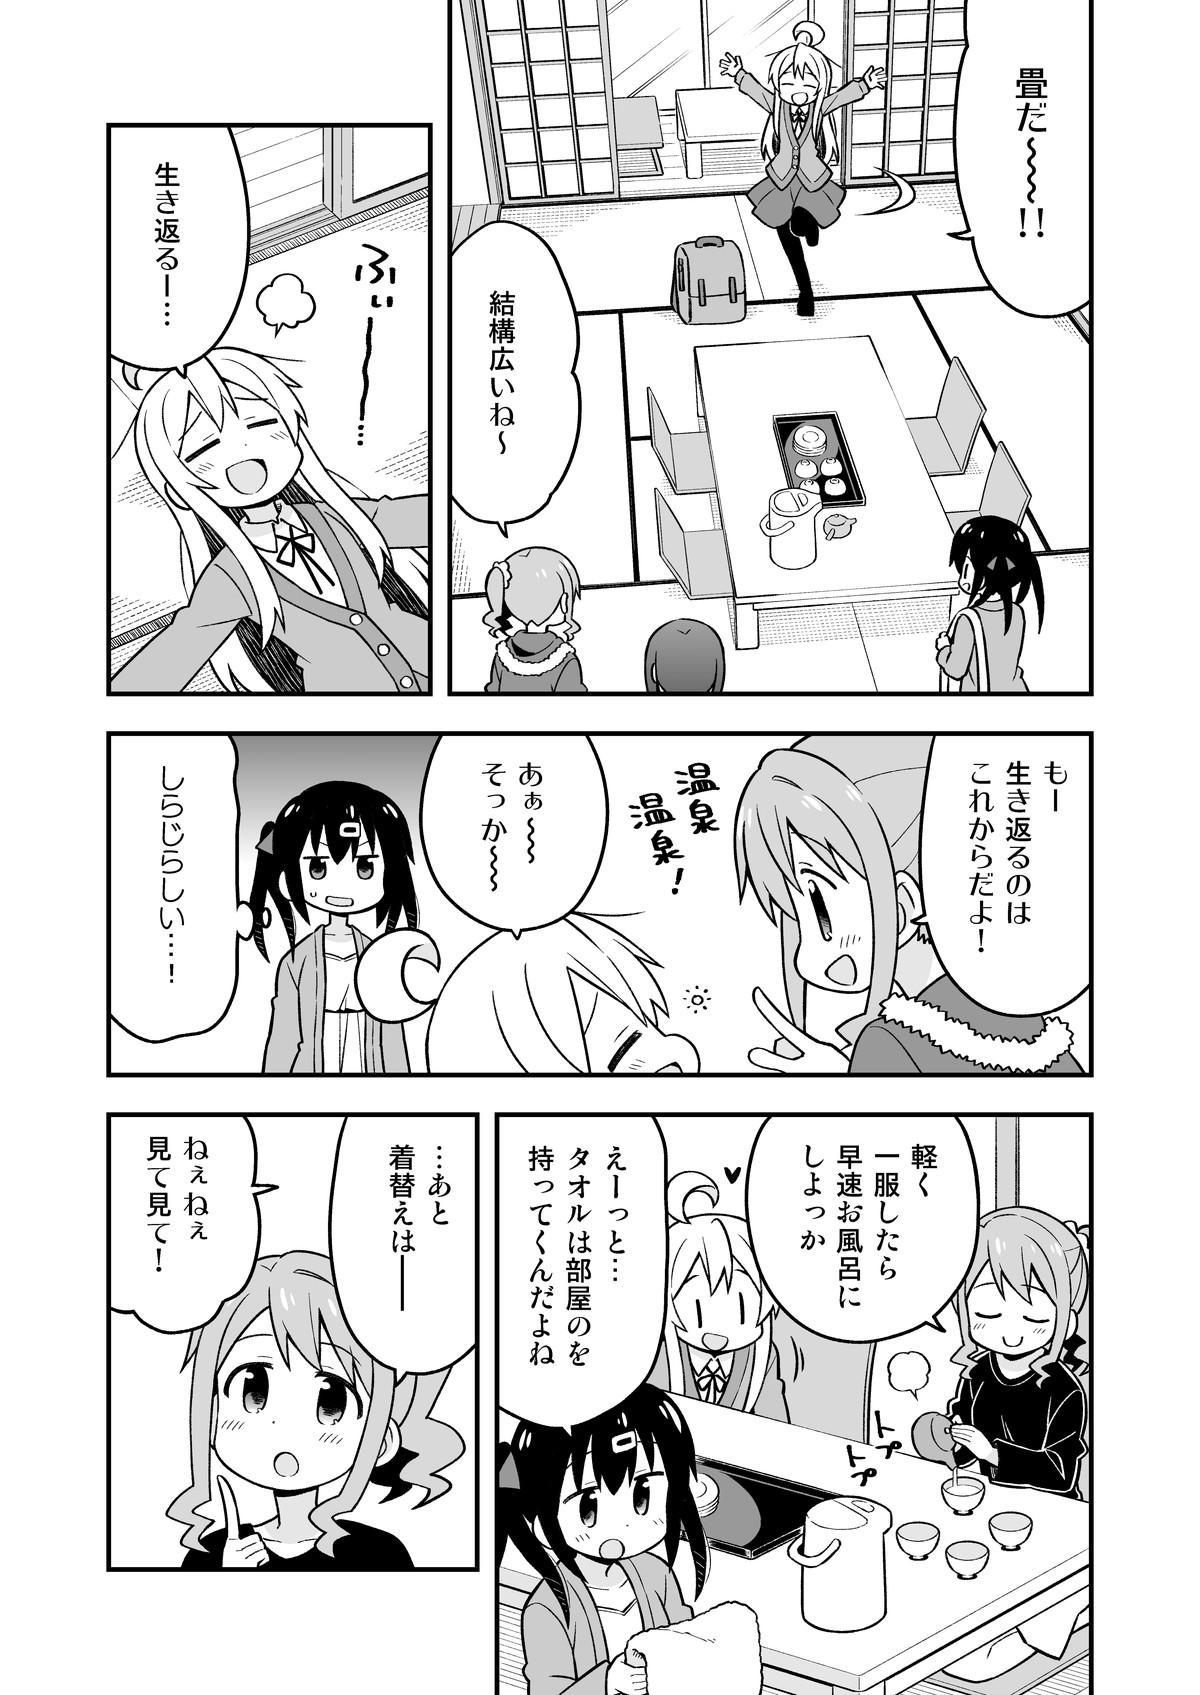 Onii-chan wa Oshimai! 6 17